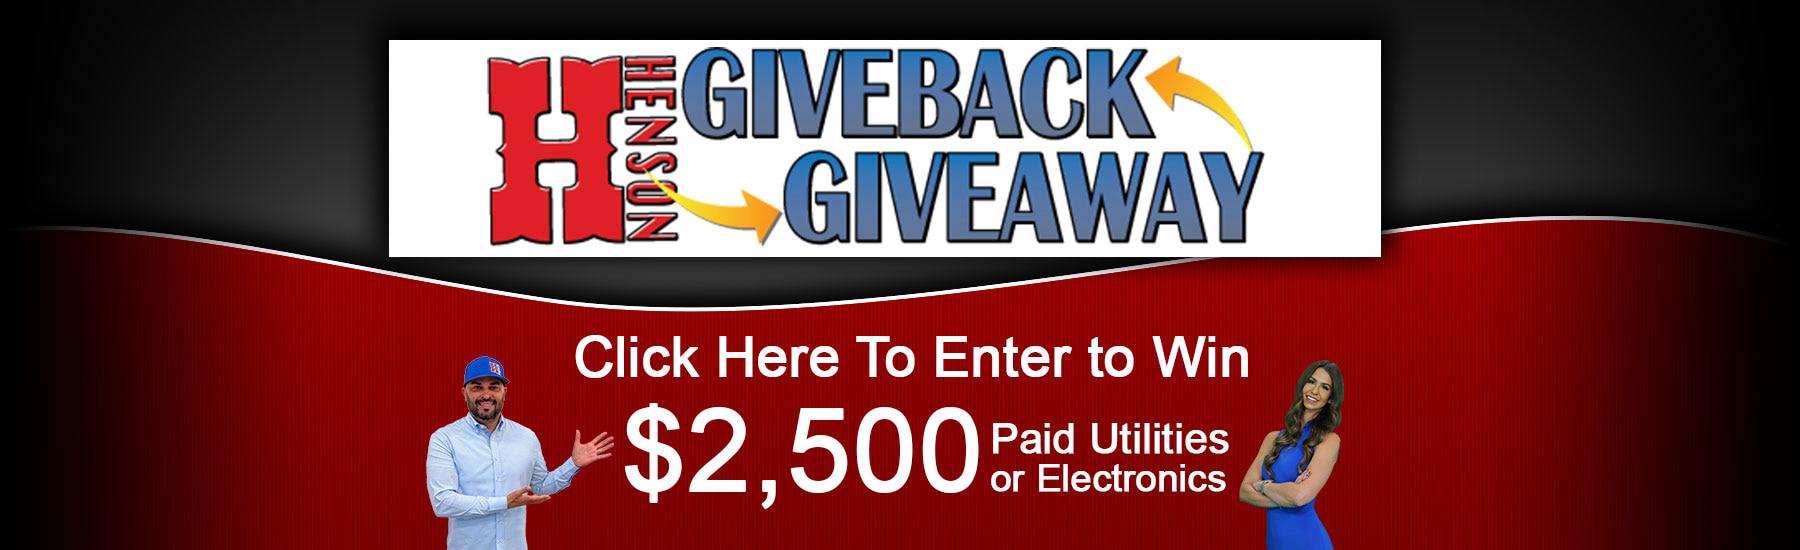 Henson Brand - 2.5K Giveback Giveaway